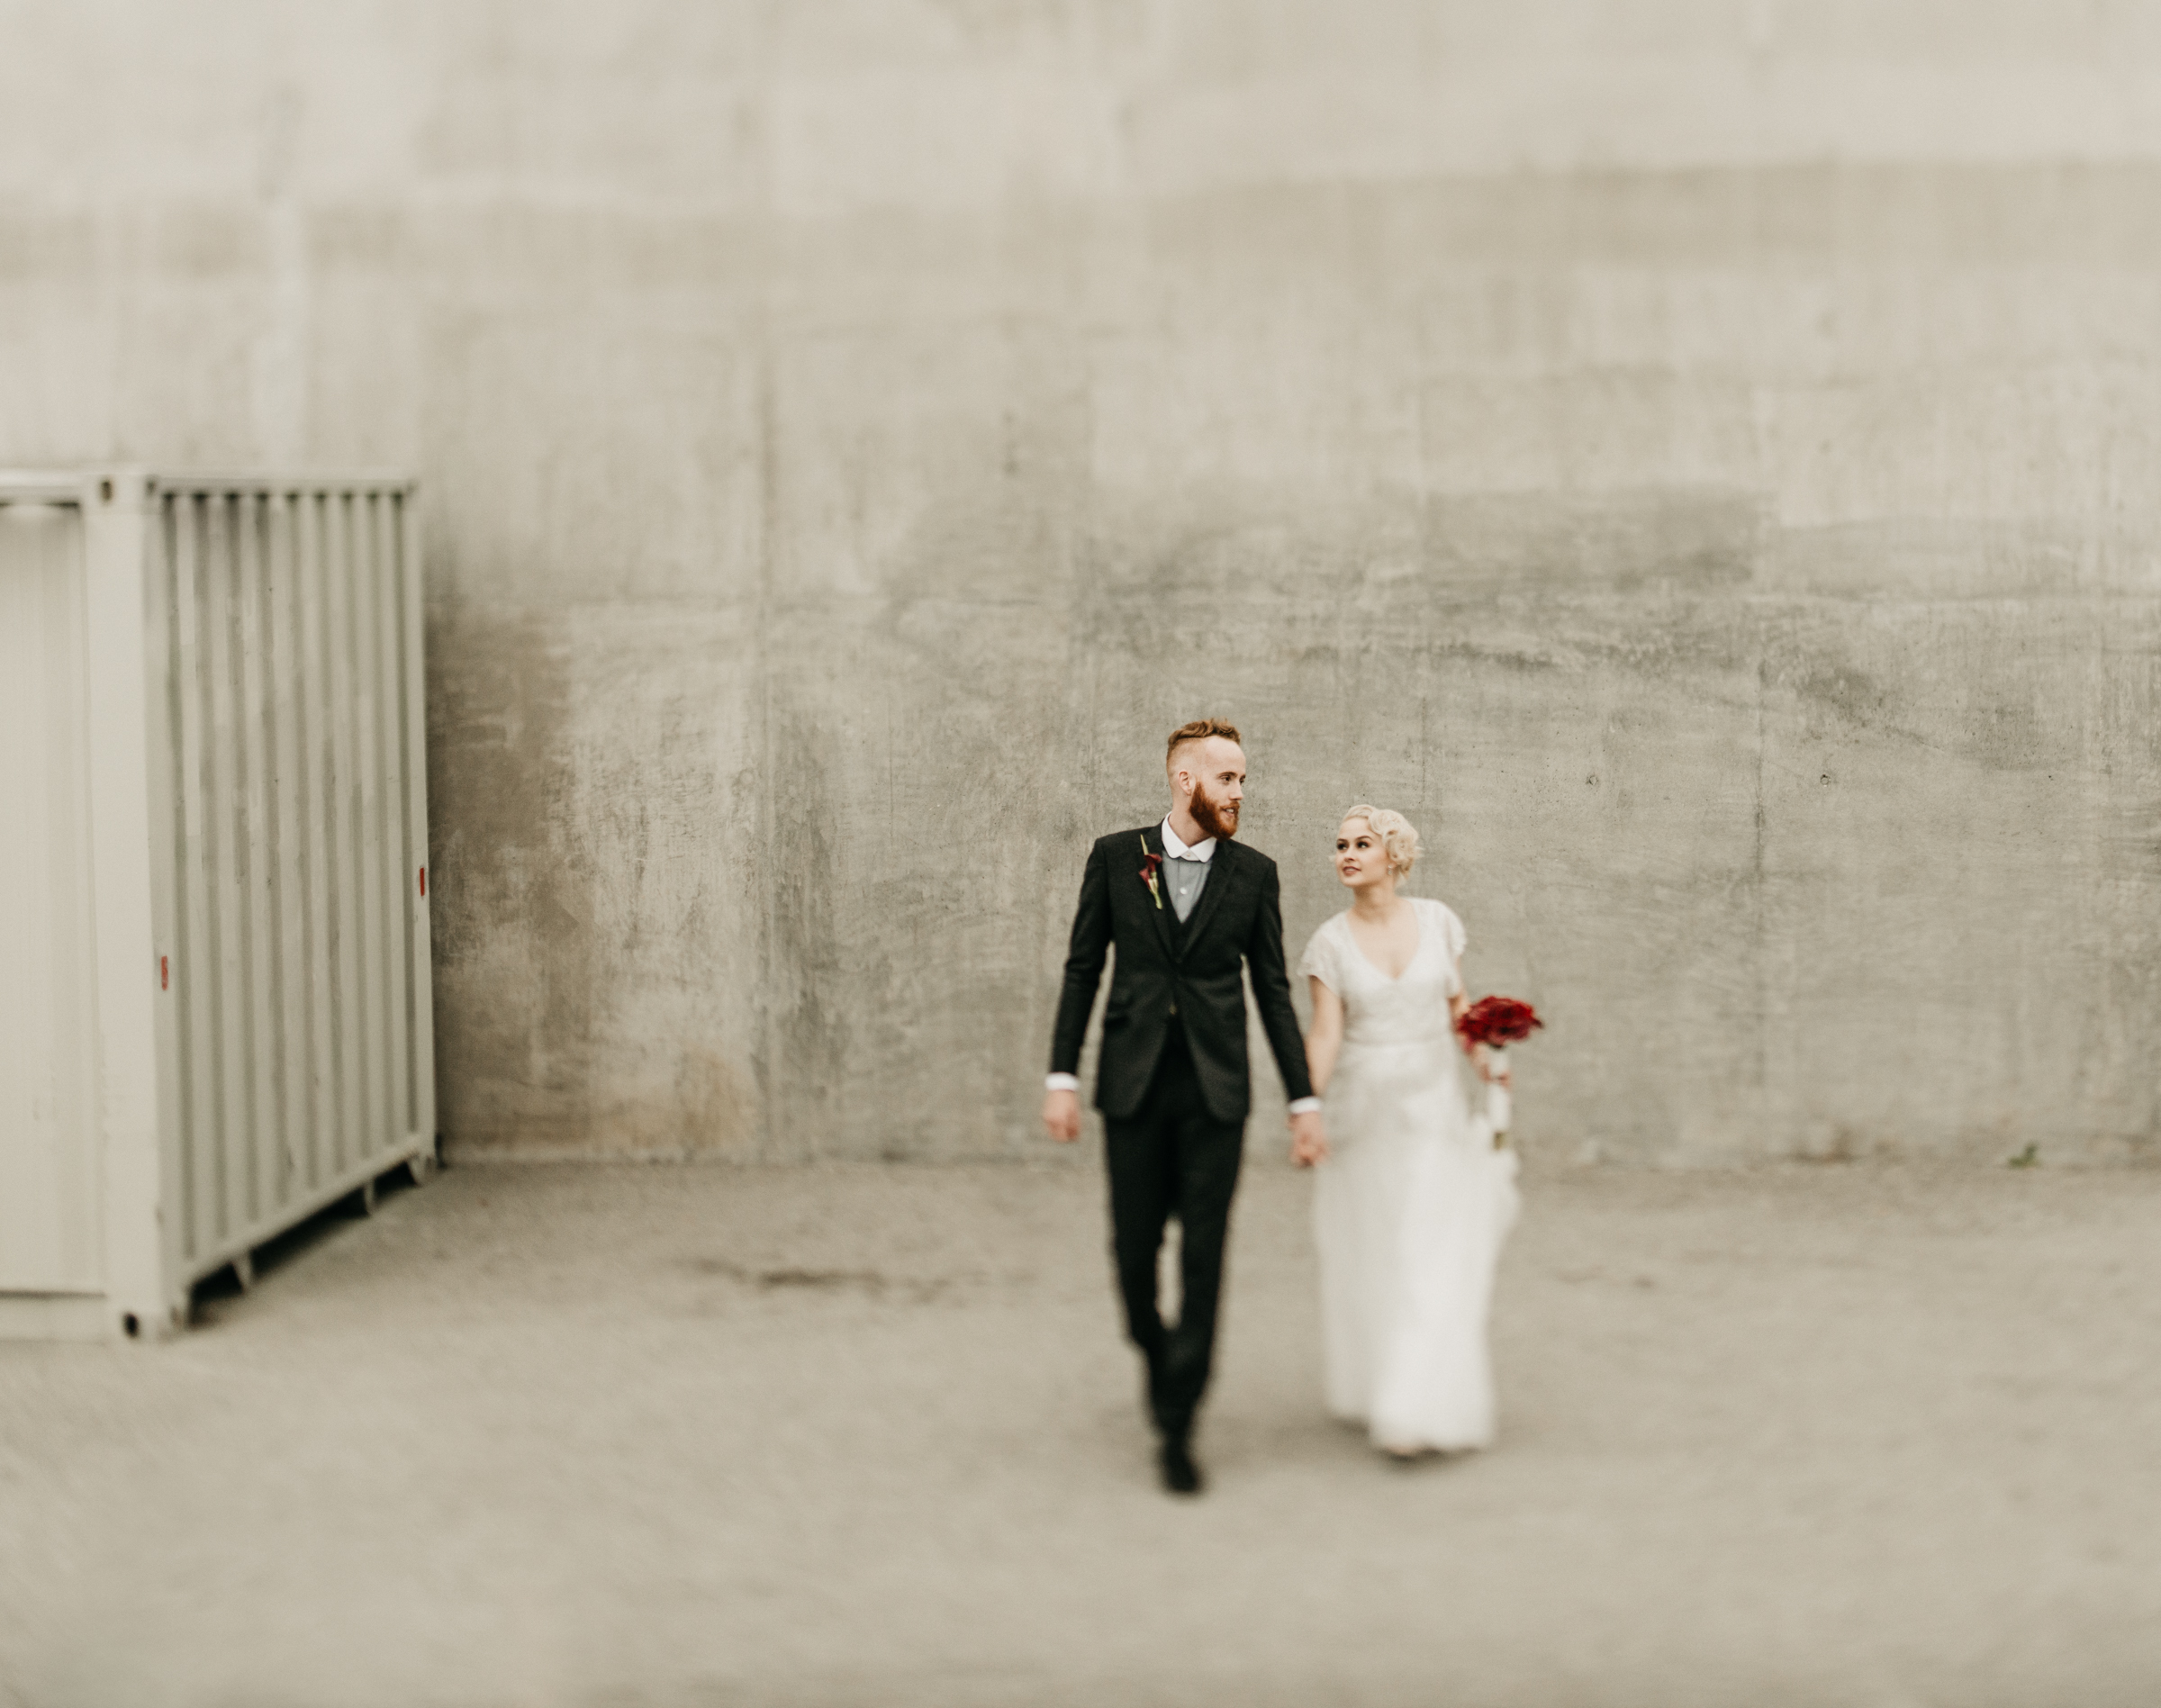 ©Isaiah + Taylor Photography - Studio 11 Wedding, Los Angeles Wedding Photographer-138.jpg